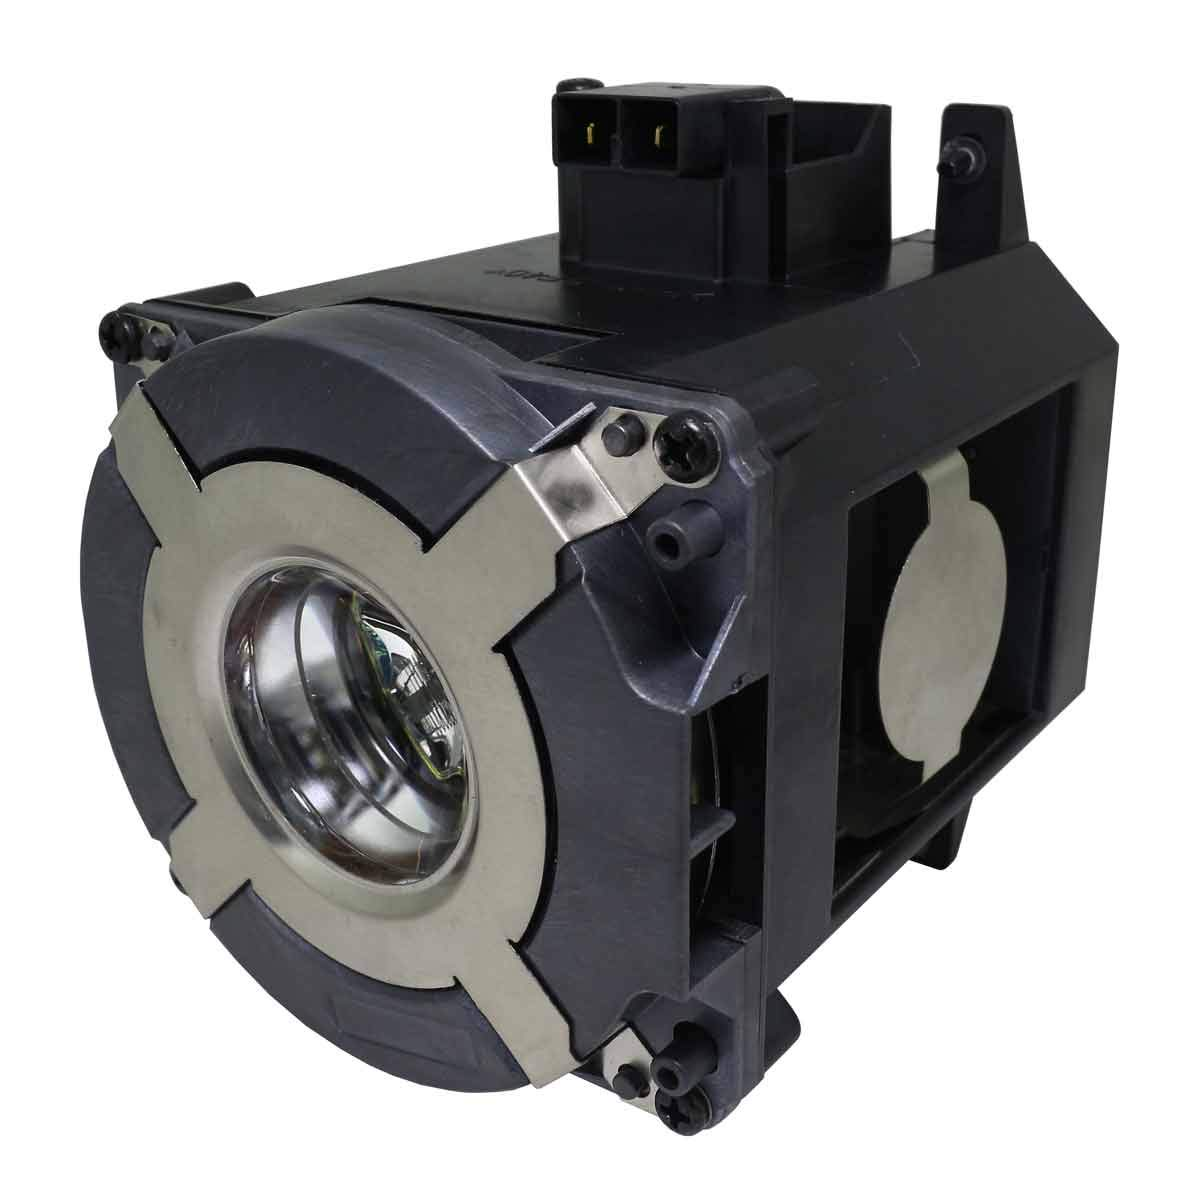 SpArc 交換用プロジェクターランプ 囲い/電球付き NEC PA521U用 Platinum (Brighter/Durable) B07MLNTYMM Lamp with Housing Platinum (Brighter/Durable)